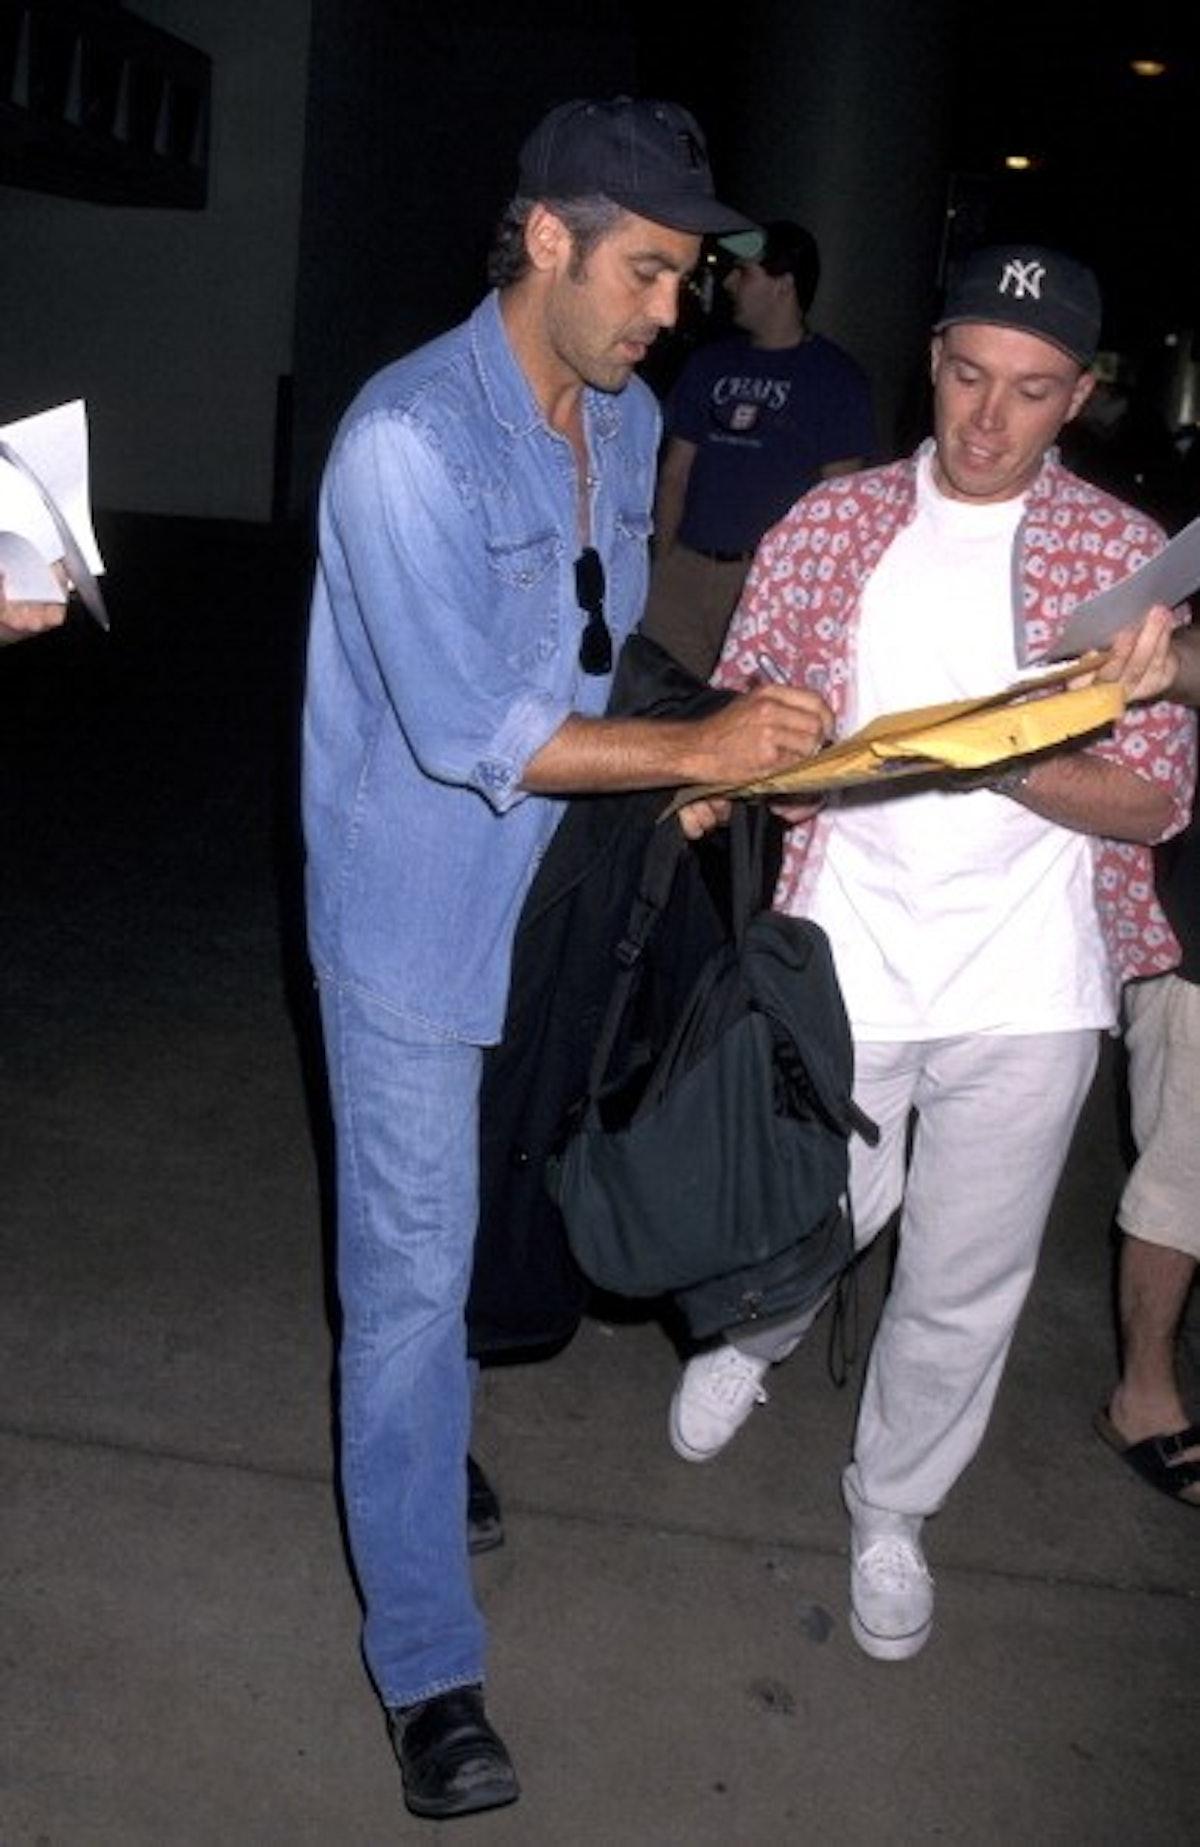 George wearing a Canadian tuxedo